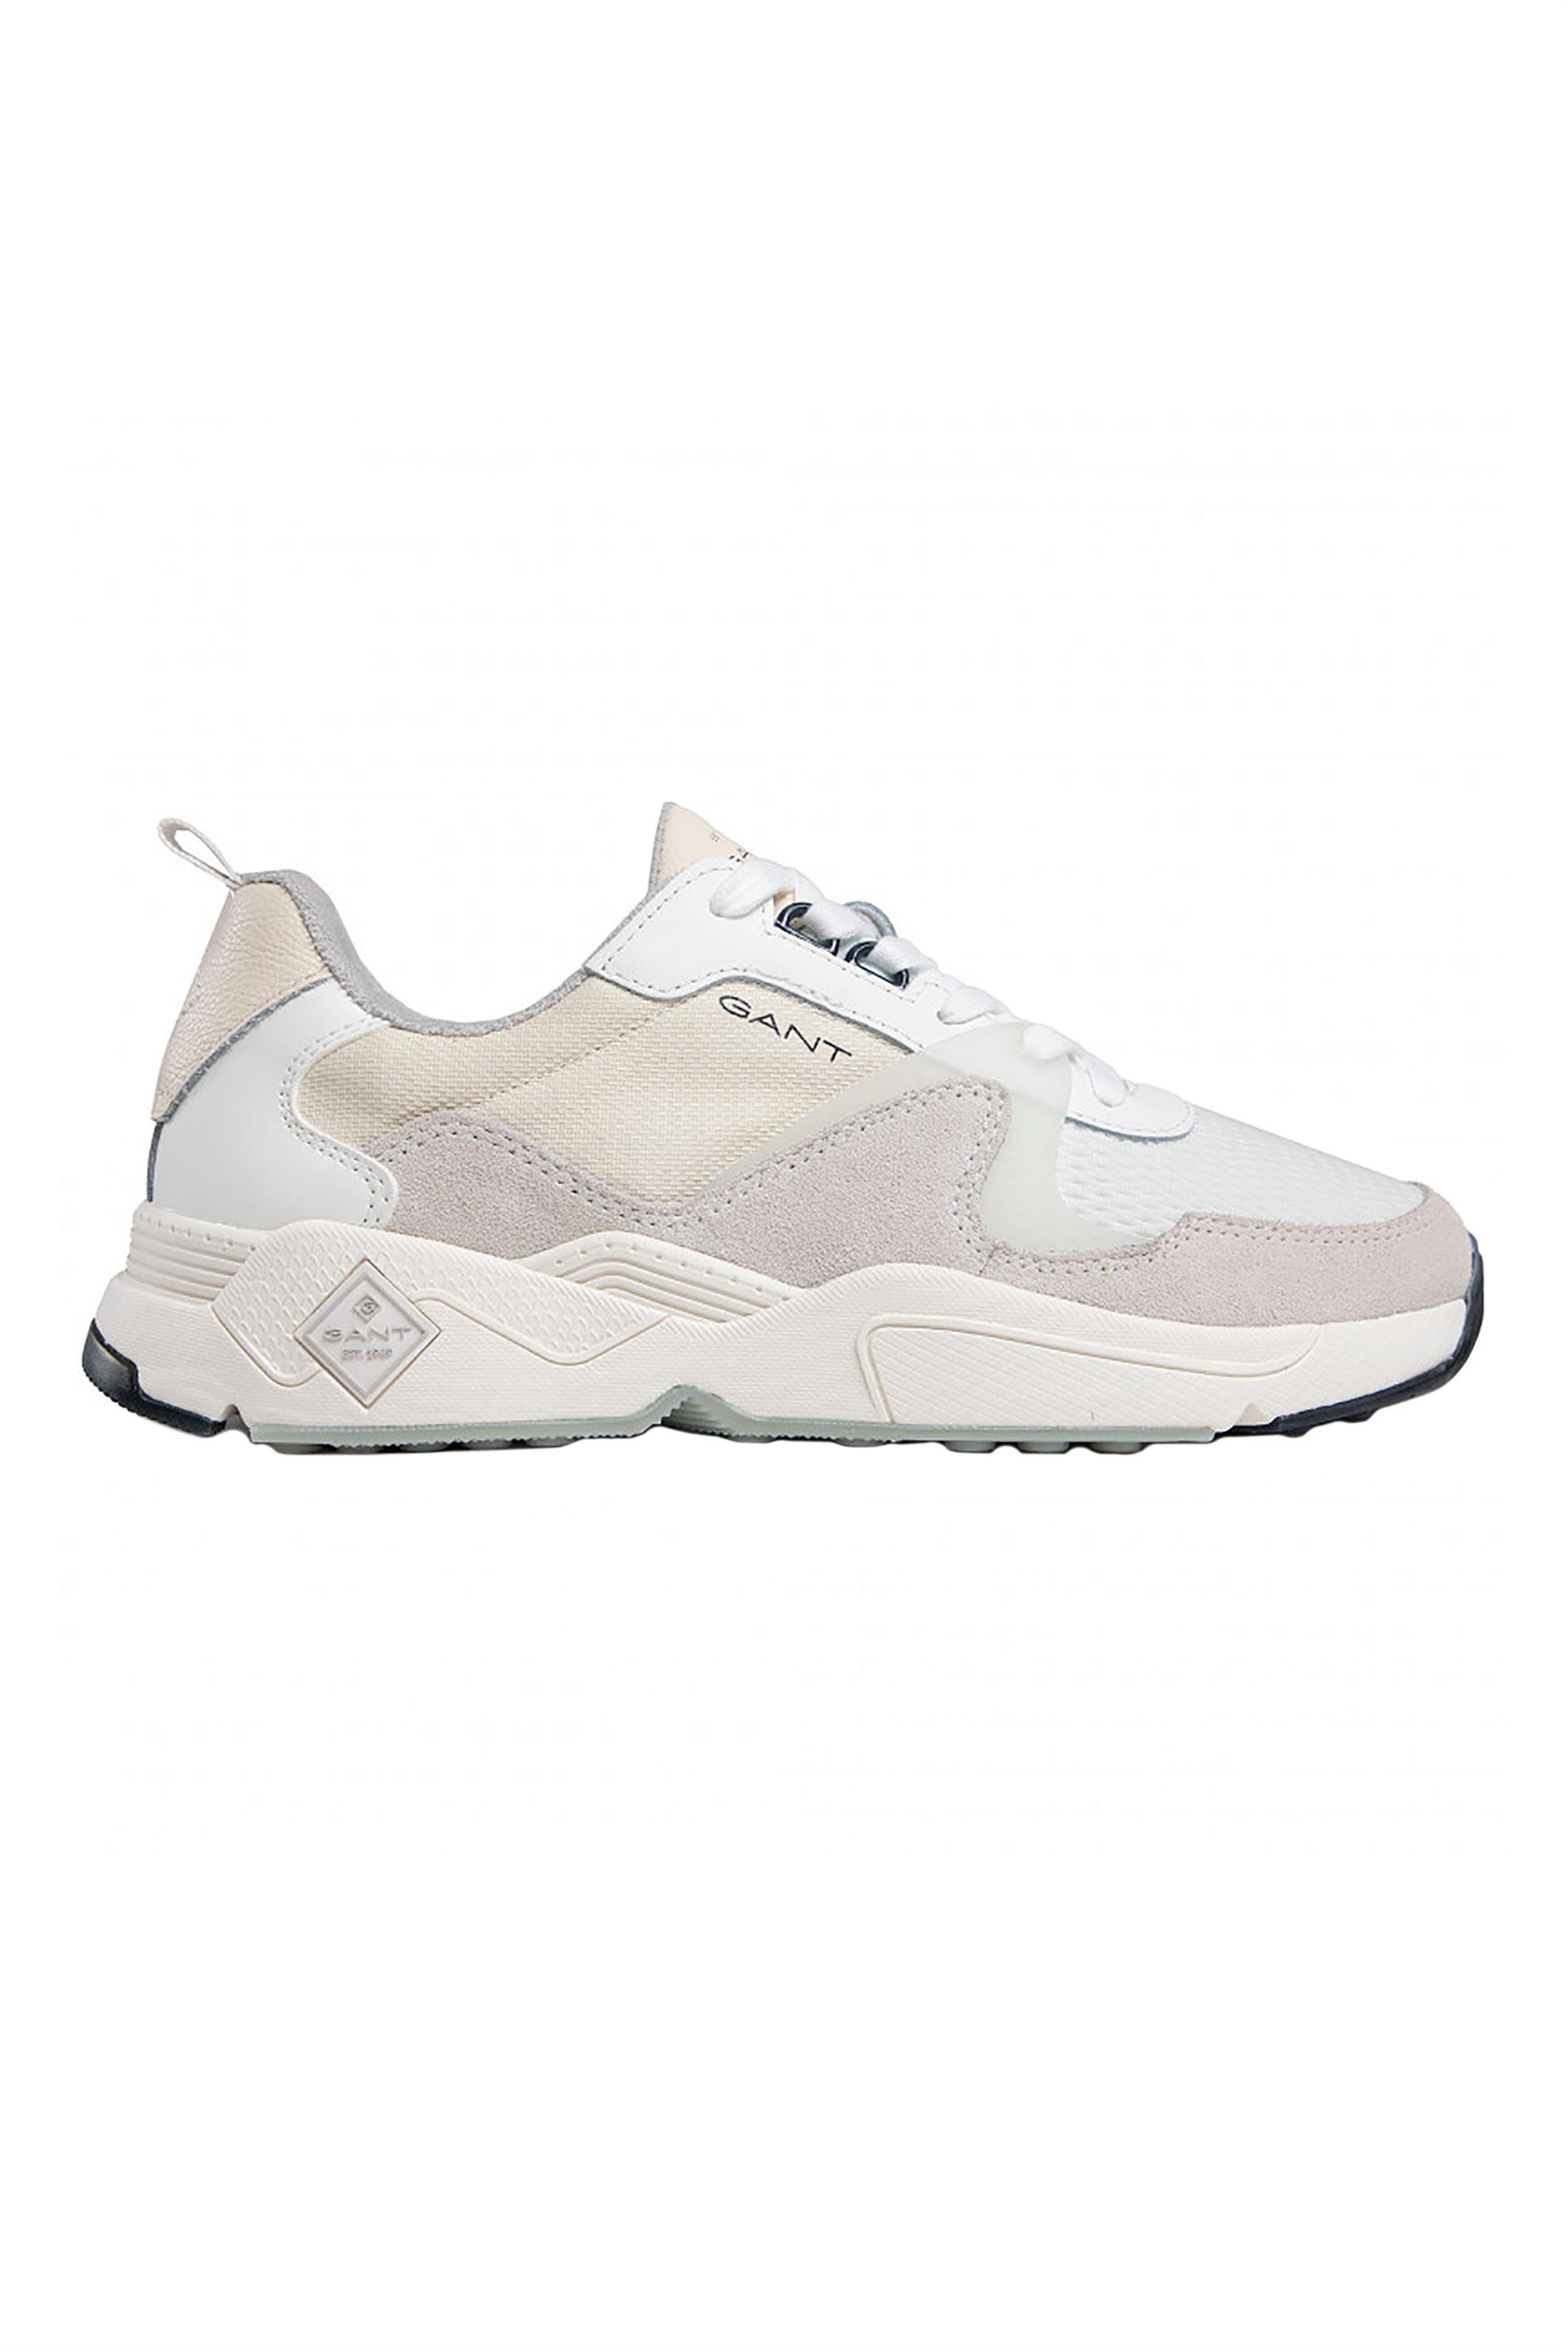 "Gant ανδρικά sneakers με logo print και suede λεπτομέρειες ""Nicewill"" – 22637657 – Μπεζ"